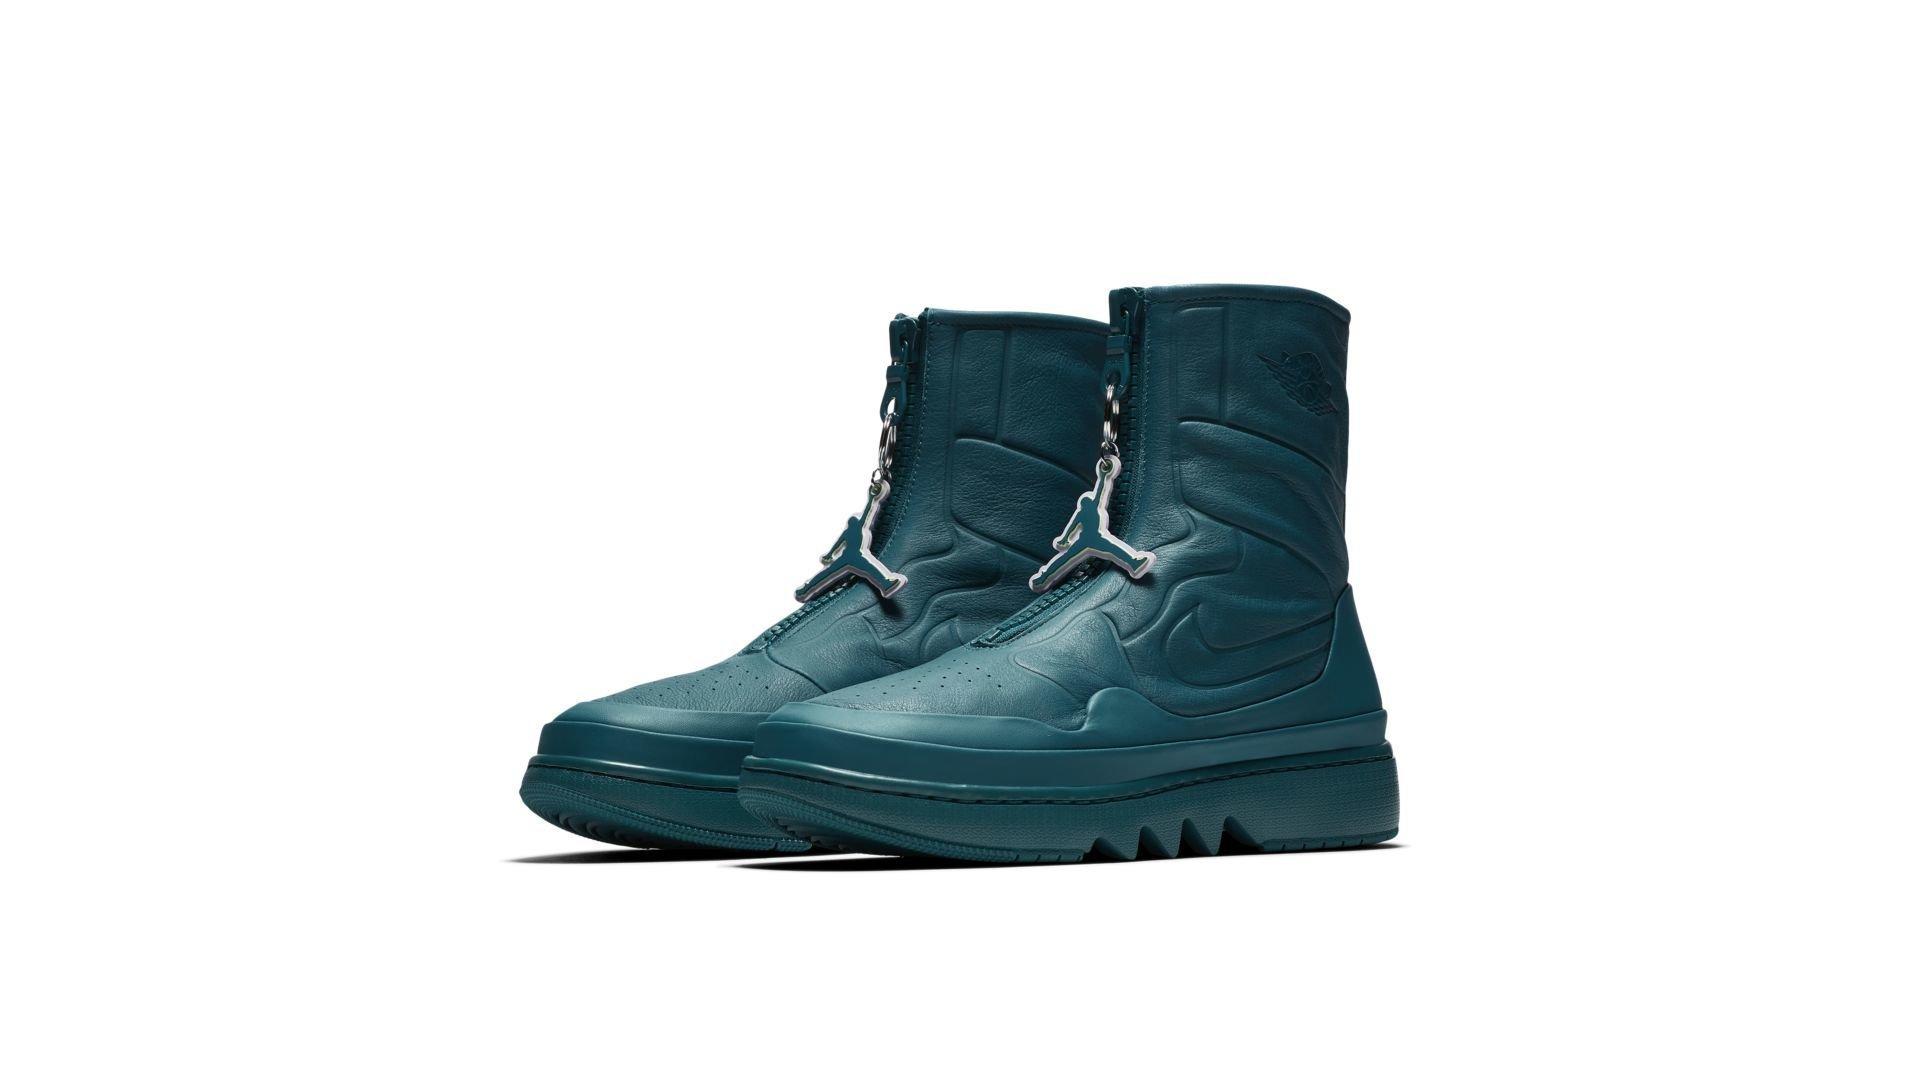 Jordan 1 Jester XX Geode Teal (W) (AO1265-300)